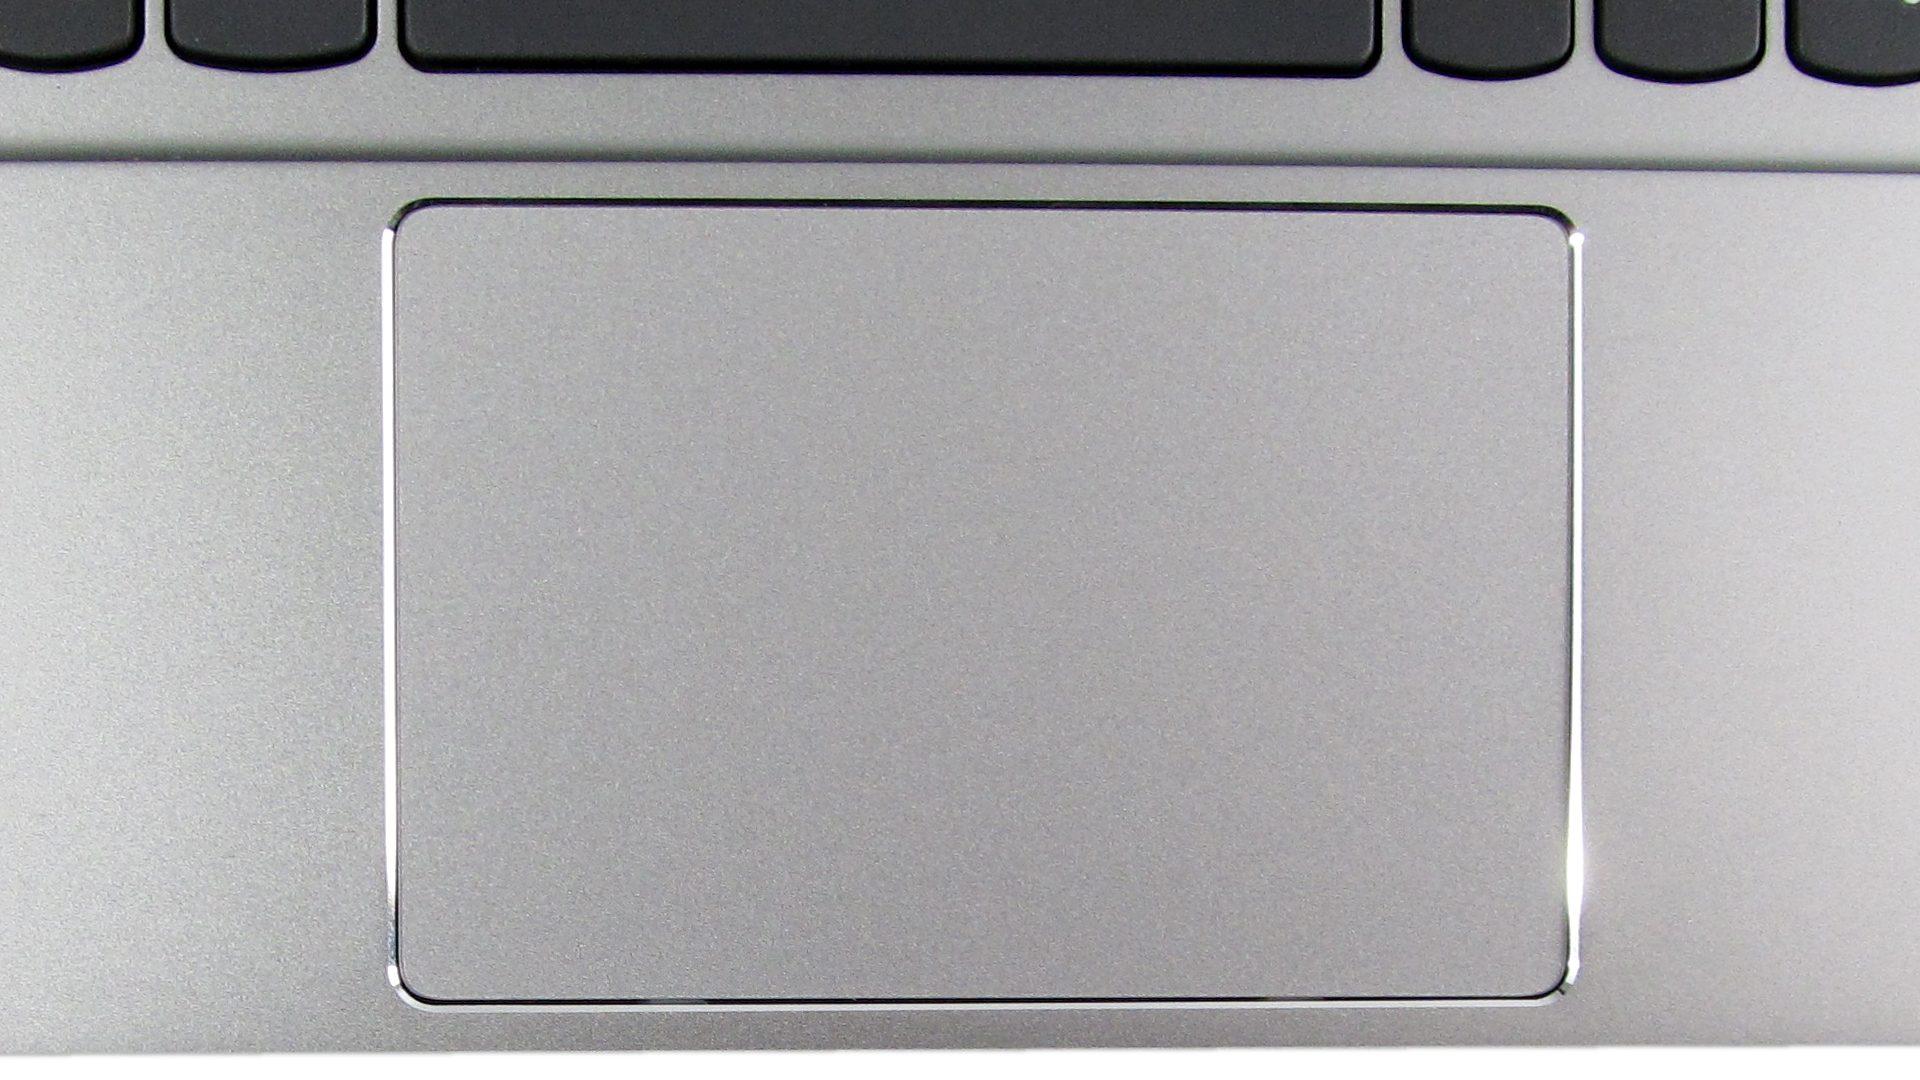 Lenovo-MIX-320-10ICR_Tastatur_3